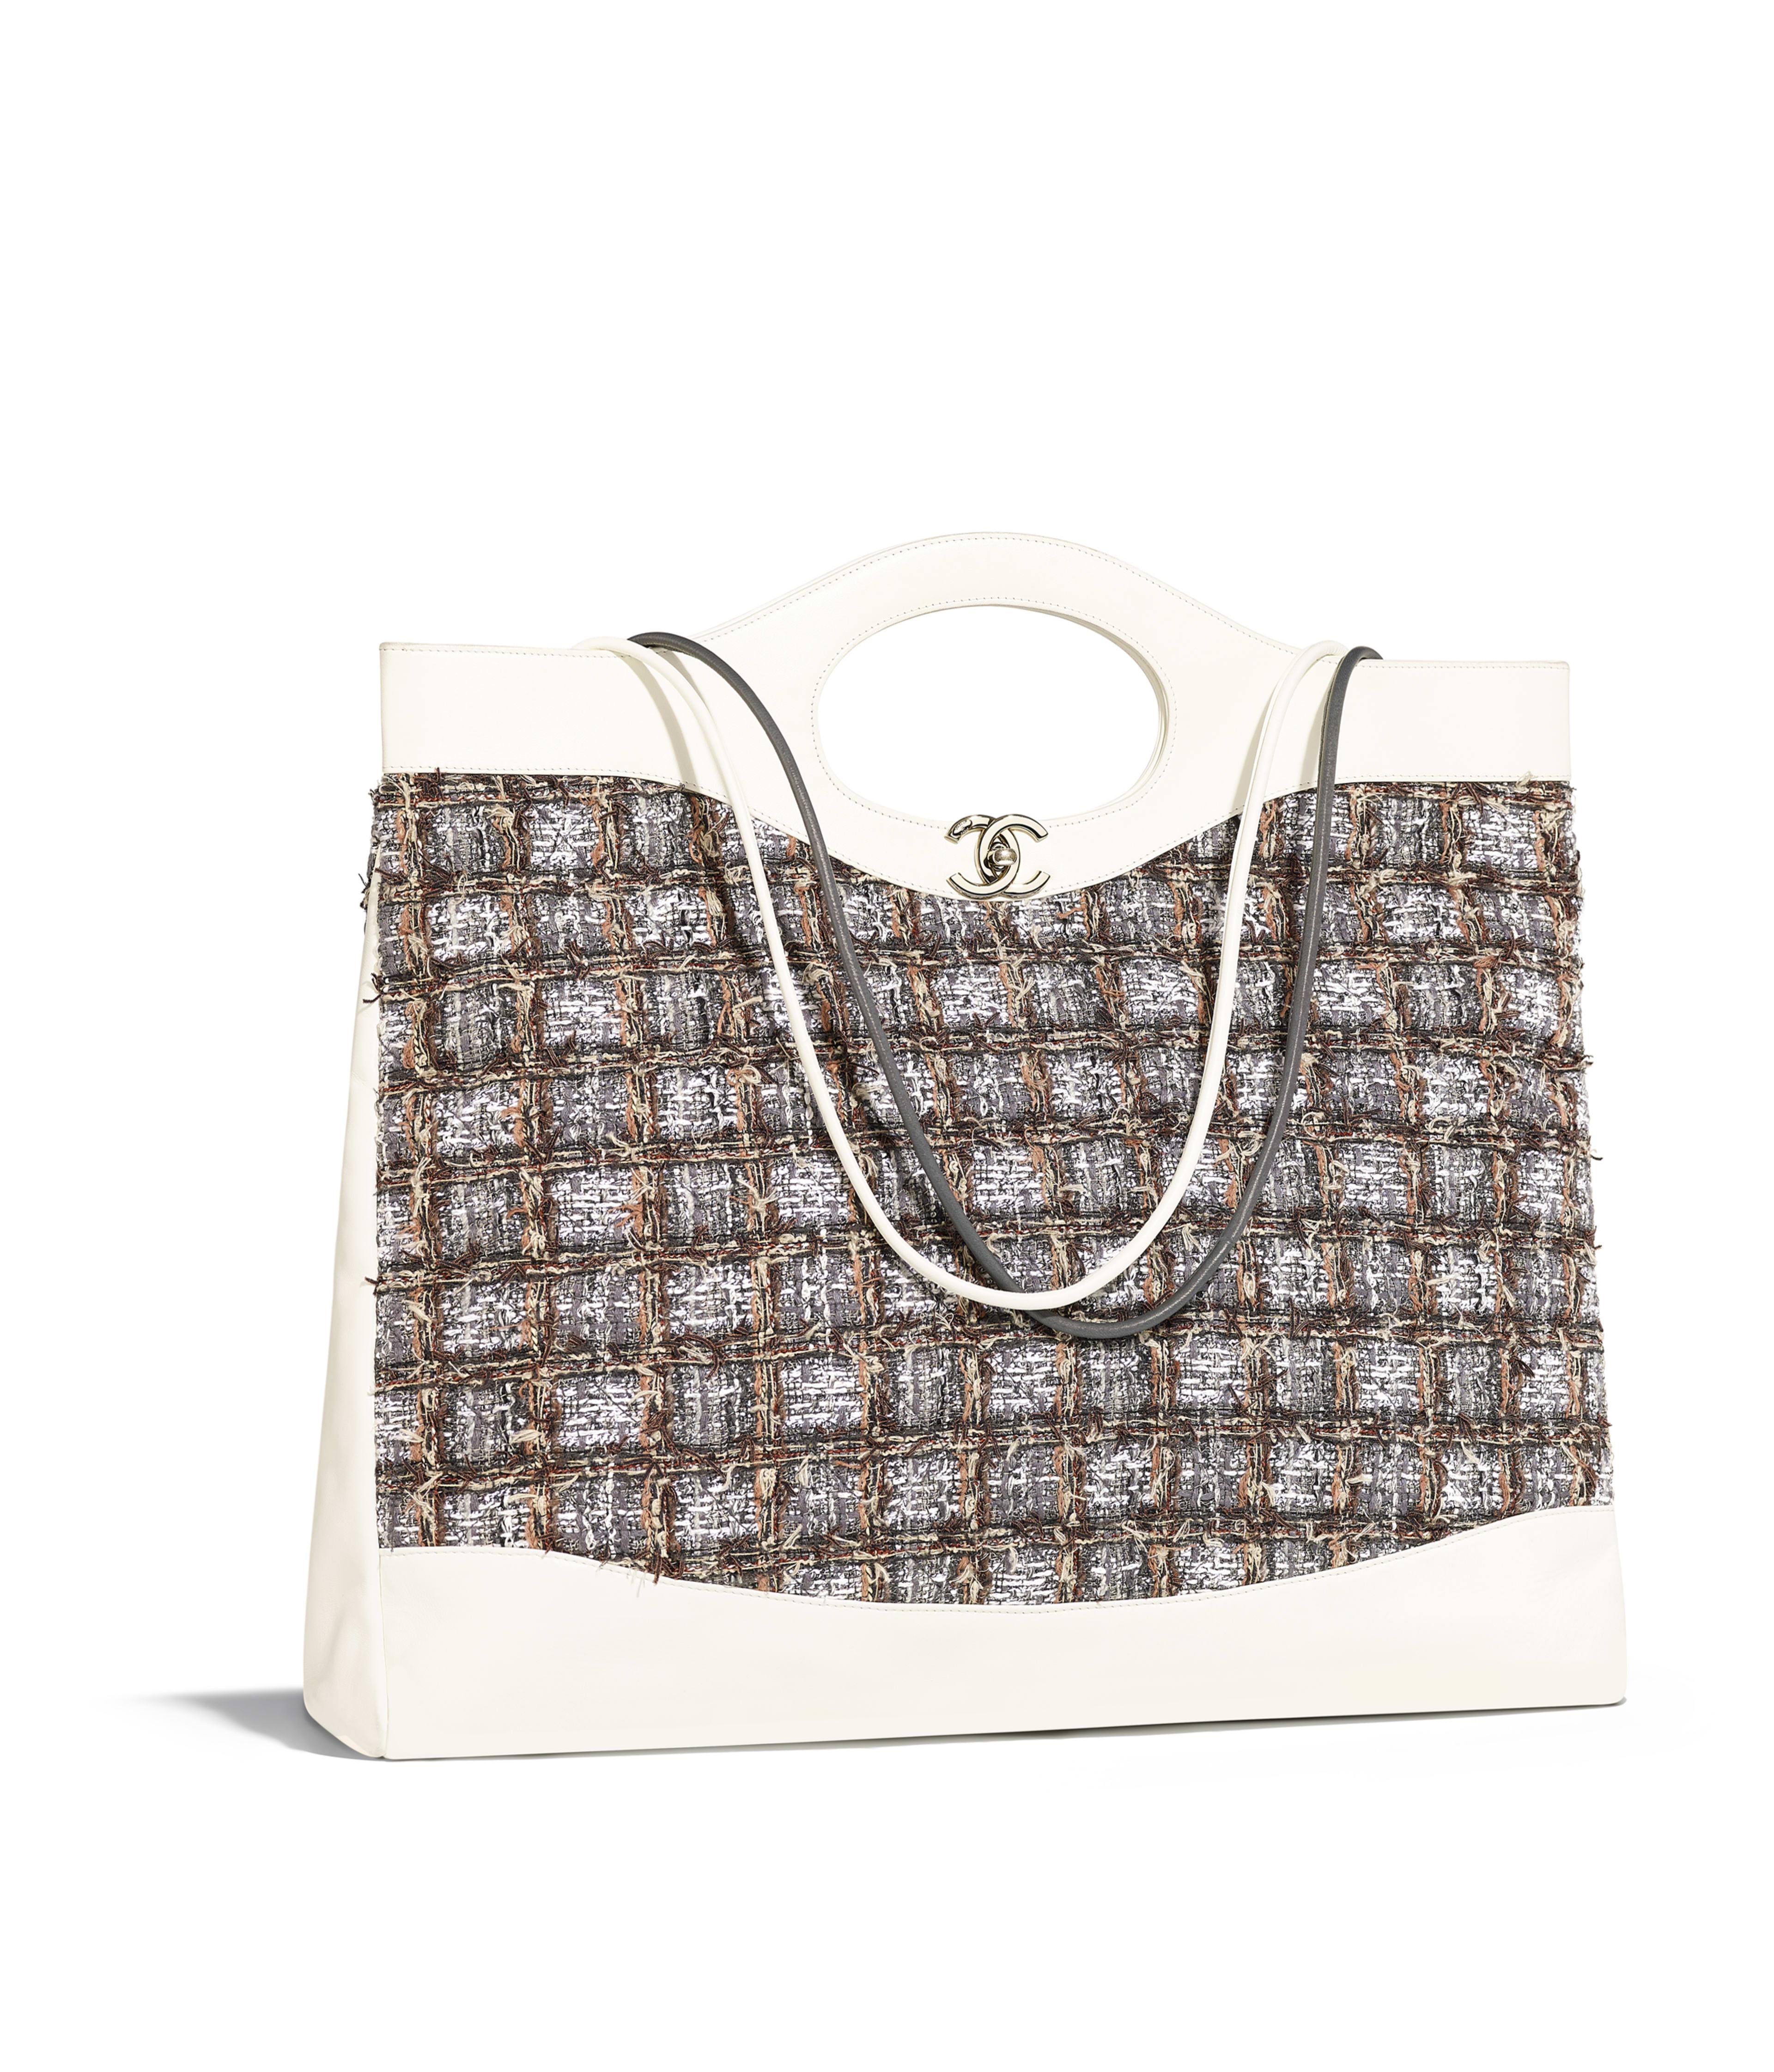 Chanel 31 Large Ping Bag Calfskin Tweed Gold Tone Metal Gray Beige Brown White Ref A57978y84009k1173